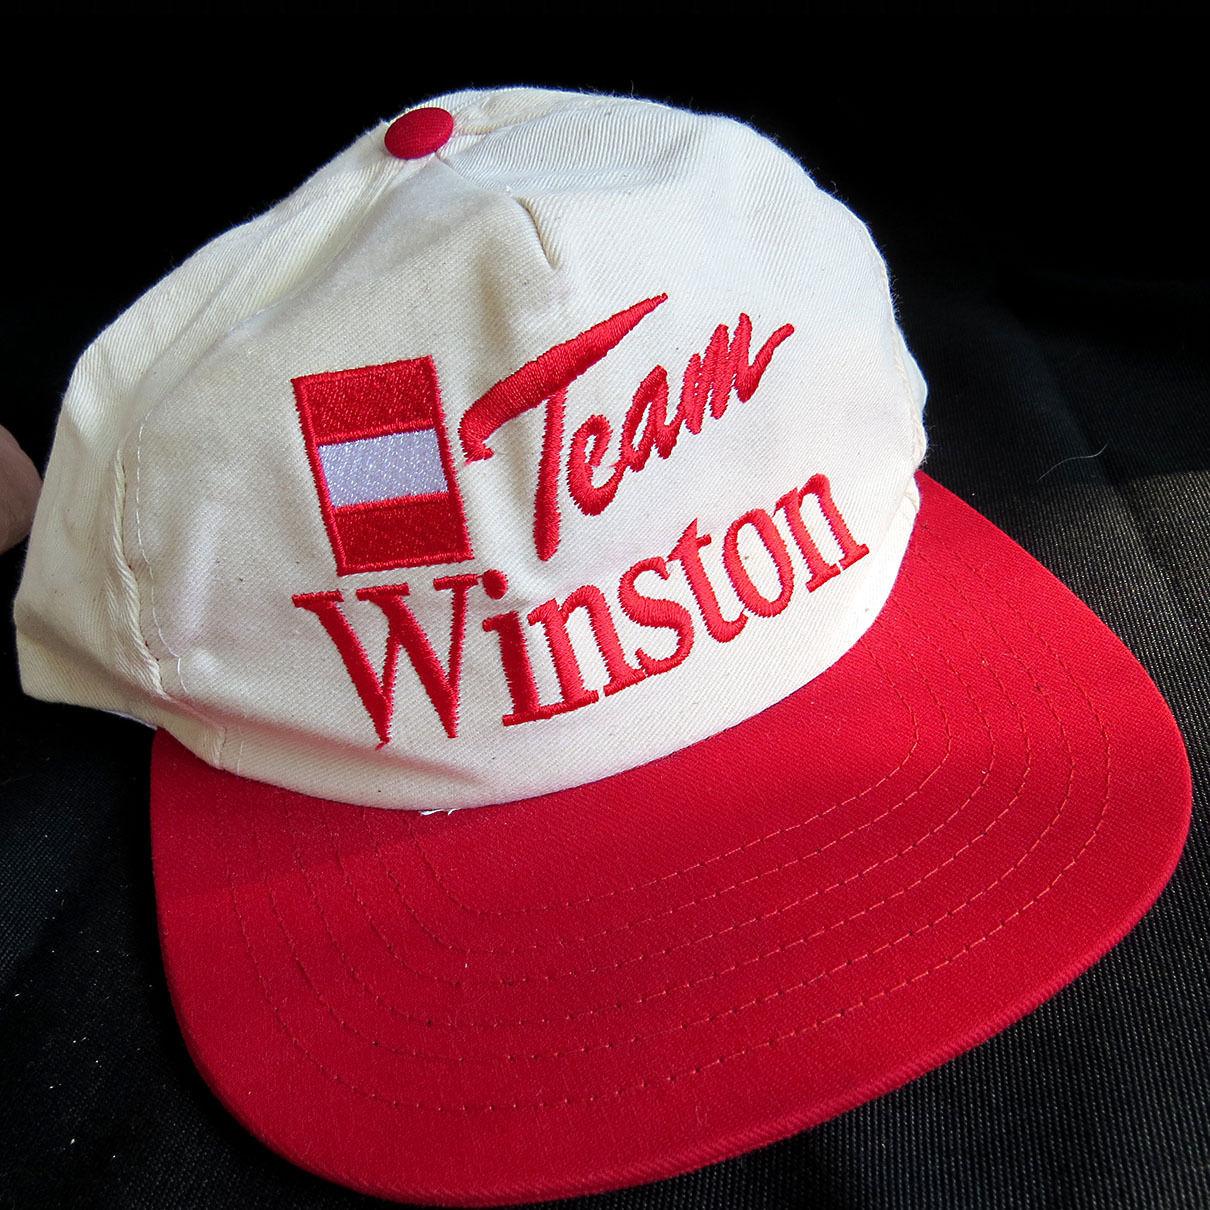 1d172caae99 57. 57. Previous. Vintage Team Winston Cigarettes Drag Racing Snapback  Baseball Hat Cap ...